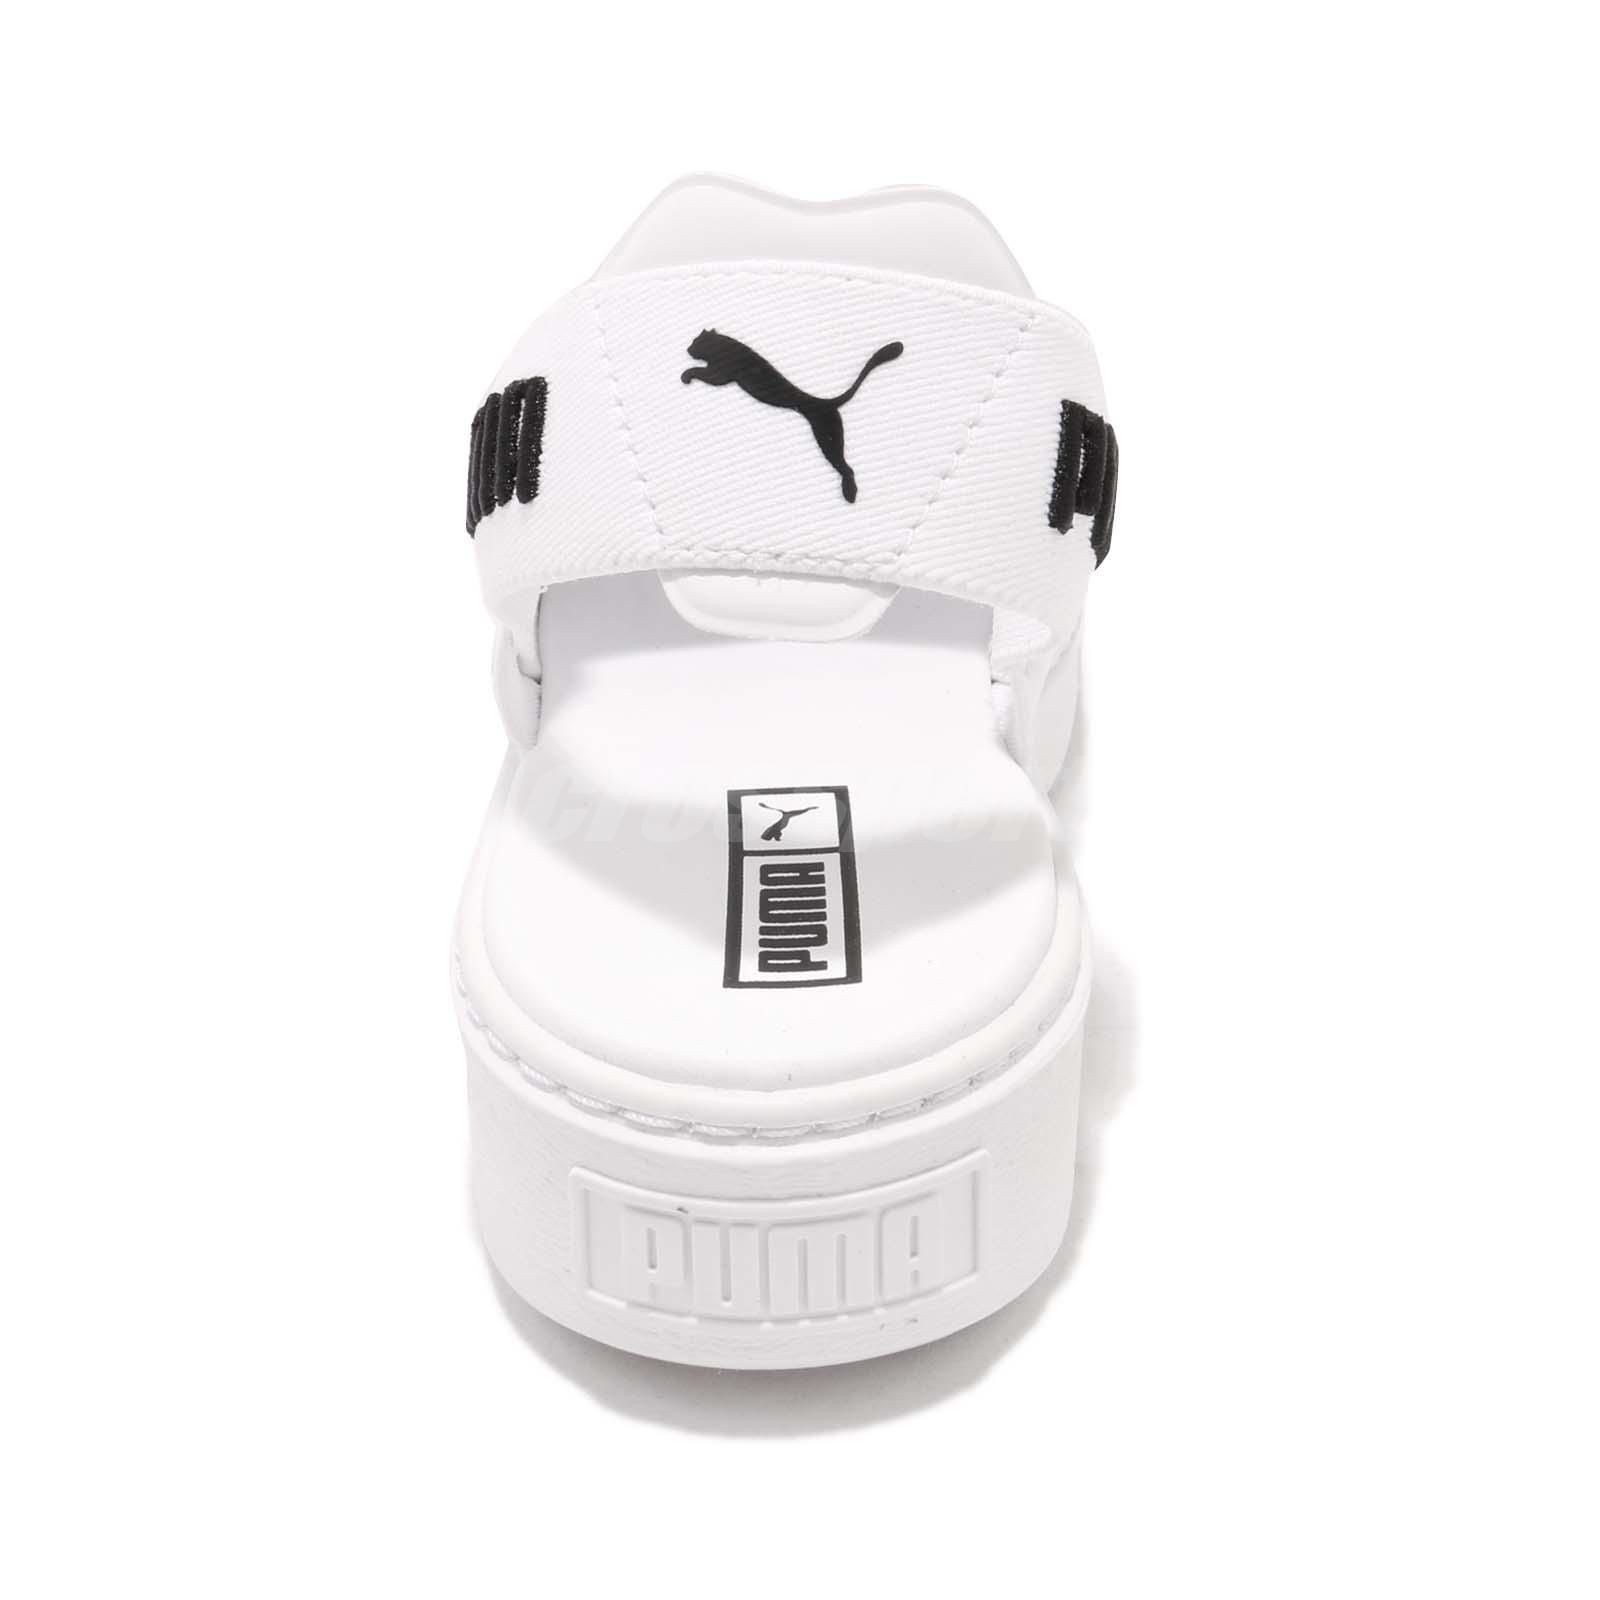 34c8e6832e1 Puma Platform Sandal Wns White Black Women Sports Lifestyle Sandal ...